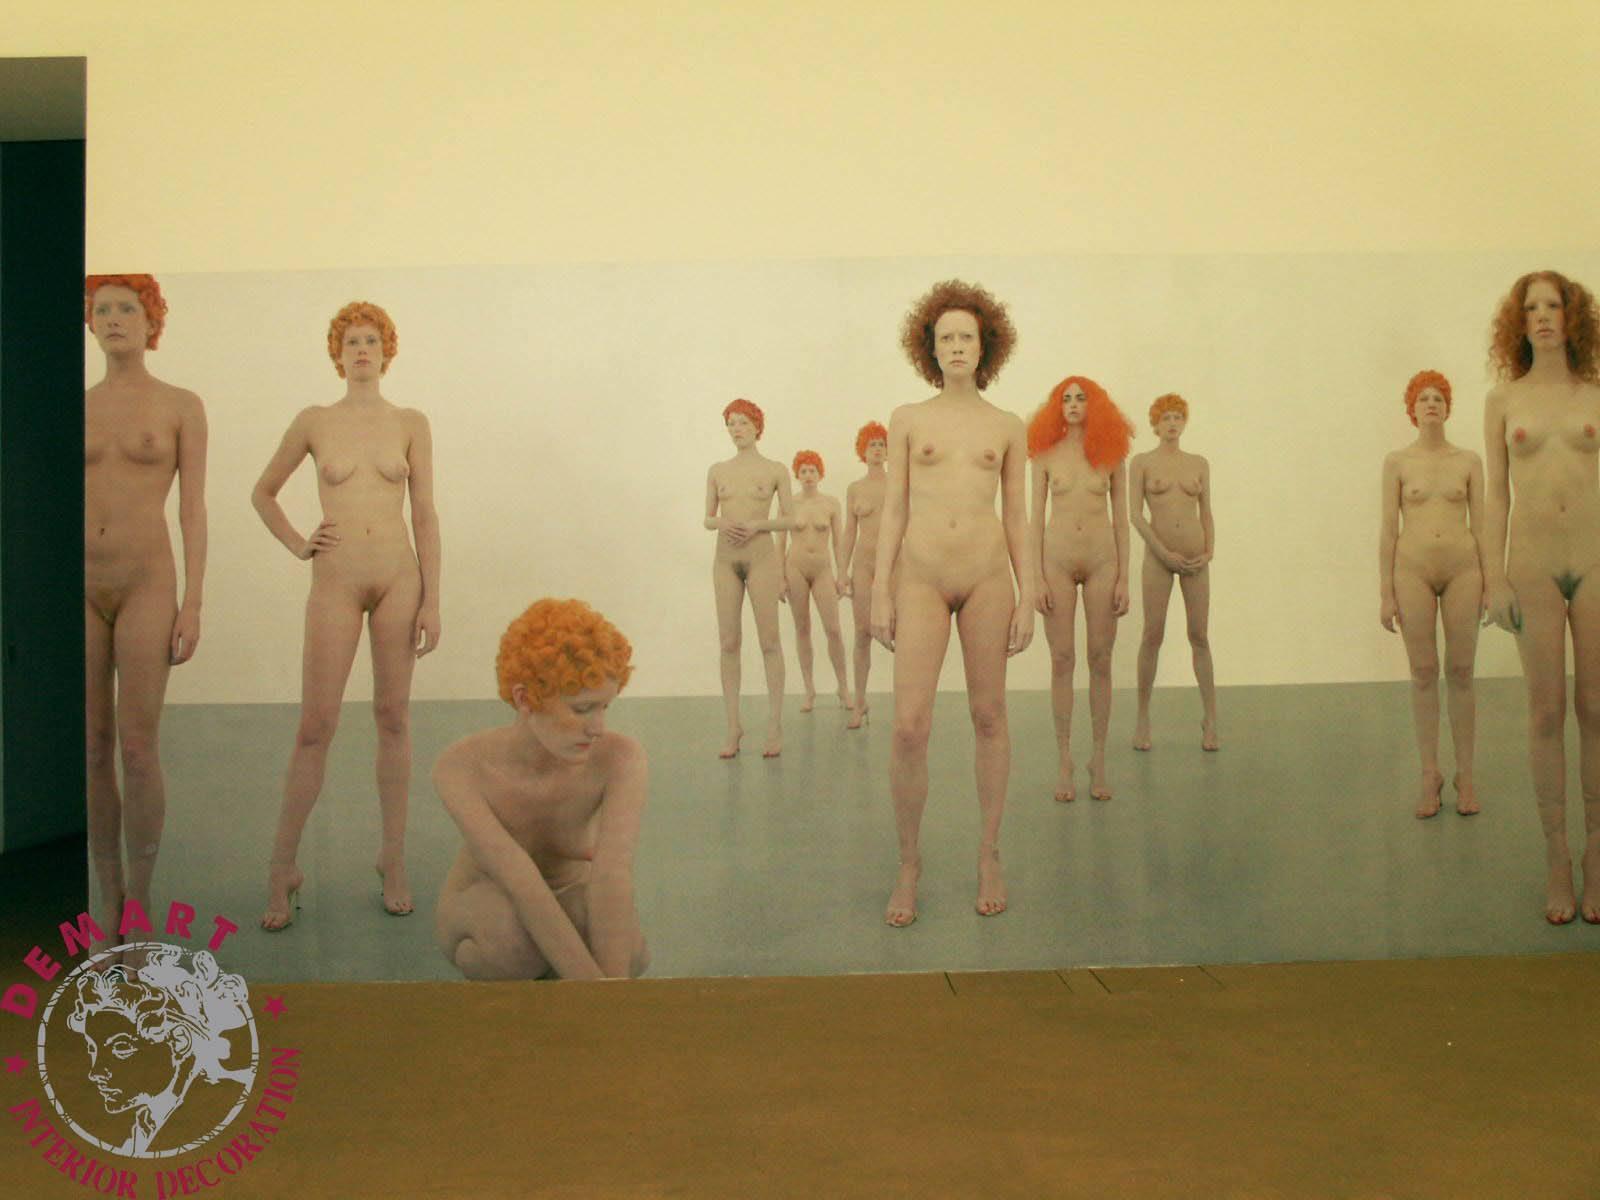 museo-arte-rivoli-vanessa-beecroft-affresco-digitale-03